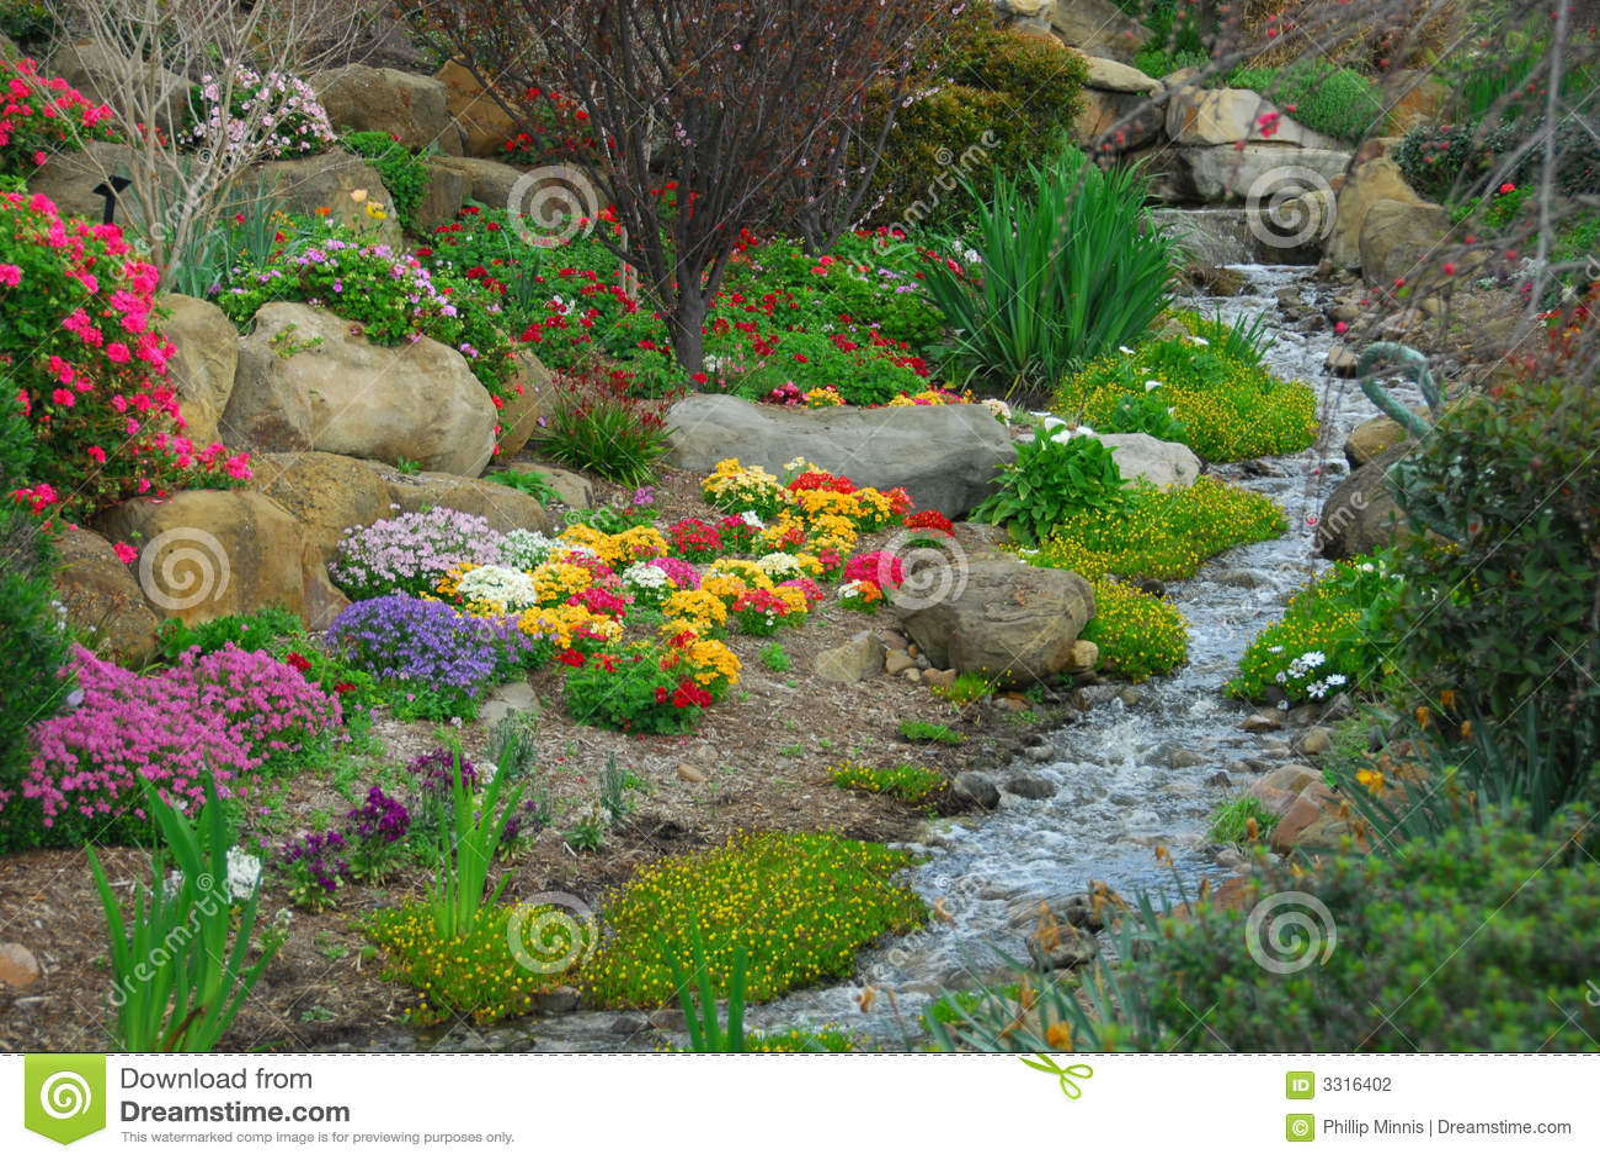 De Stroom van de tuin